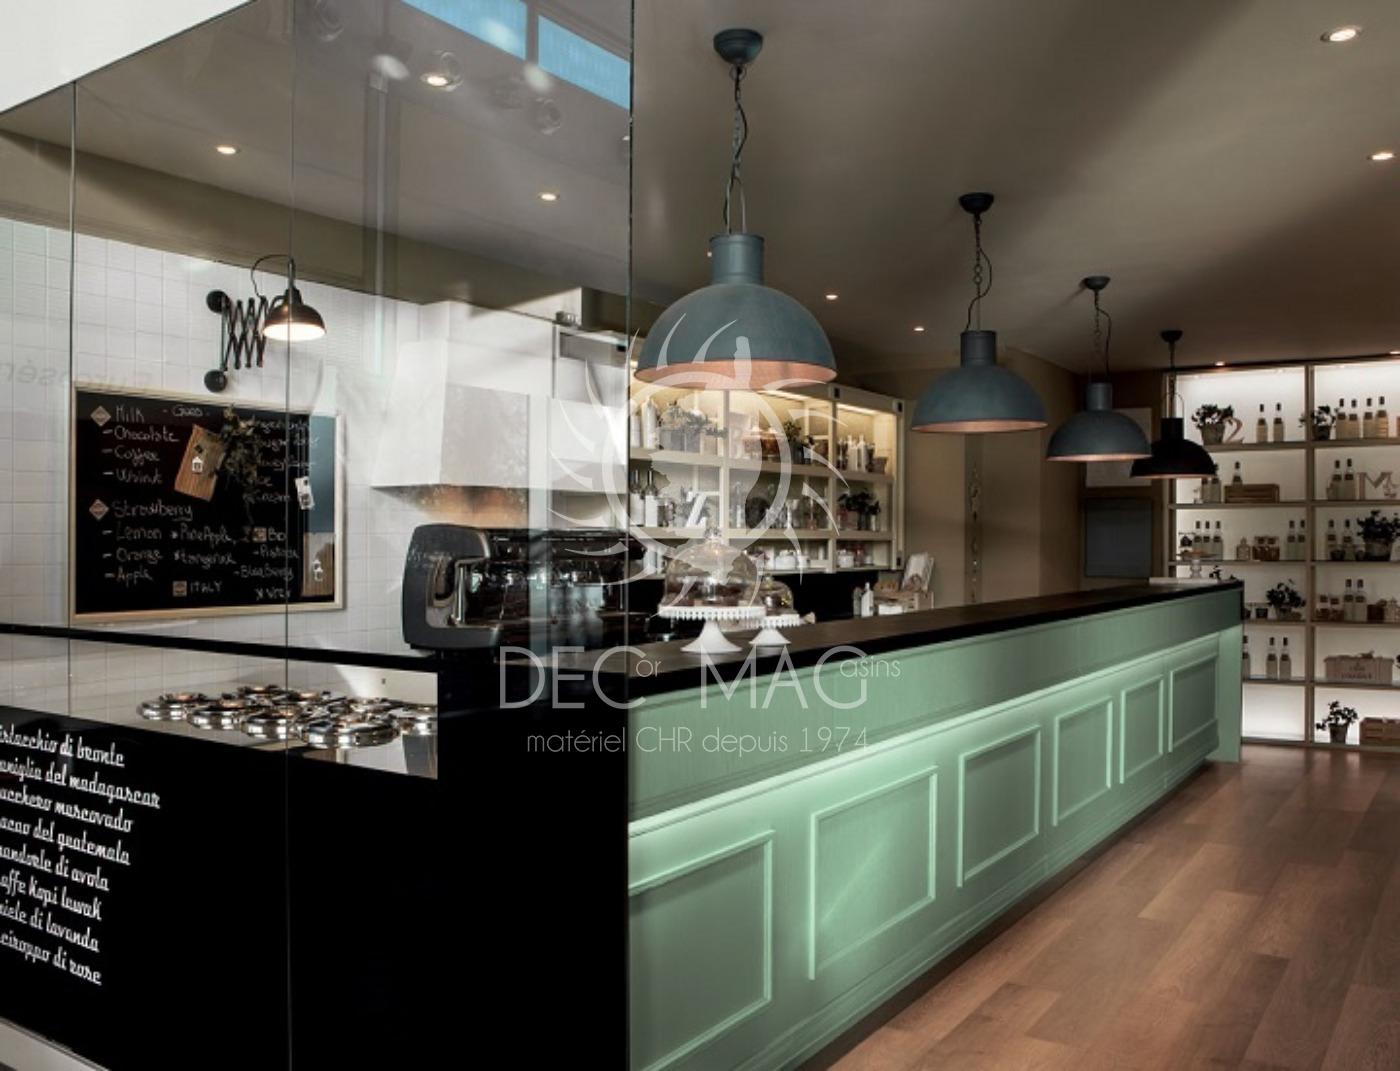 decor magasin vente trevi agencement bastia en corse. Black Bedroom Furniture Sets. Home Design Ideas